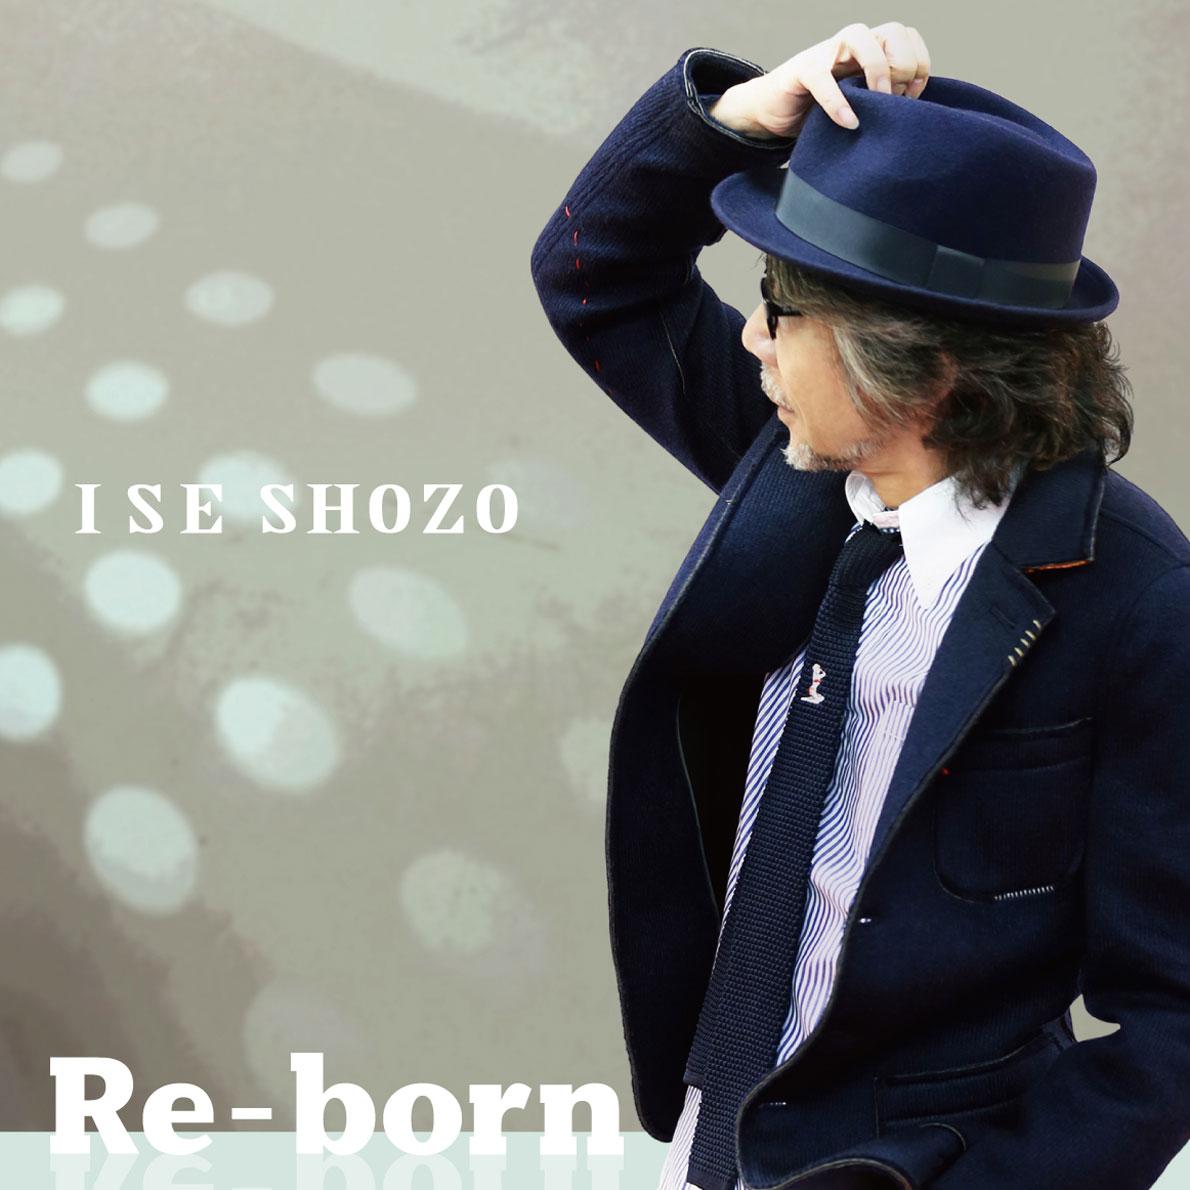 伊勢正三「Re-born」